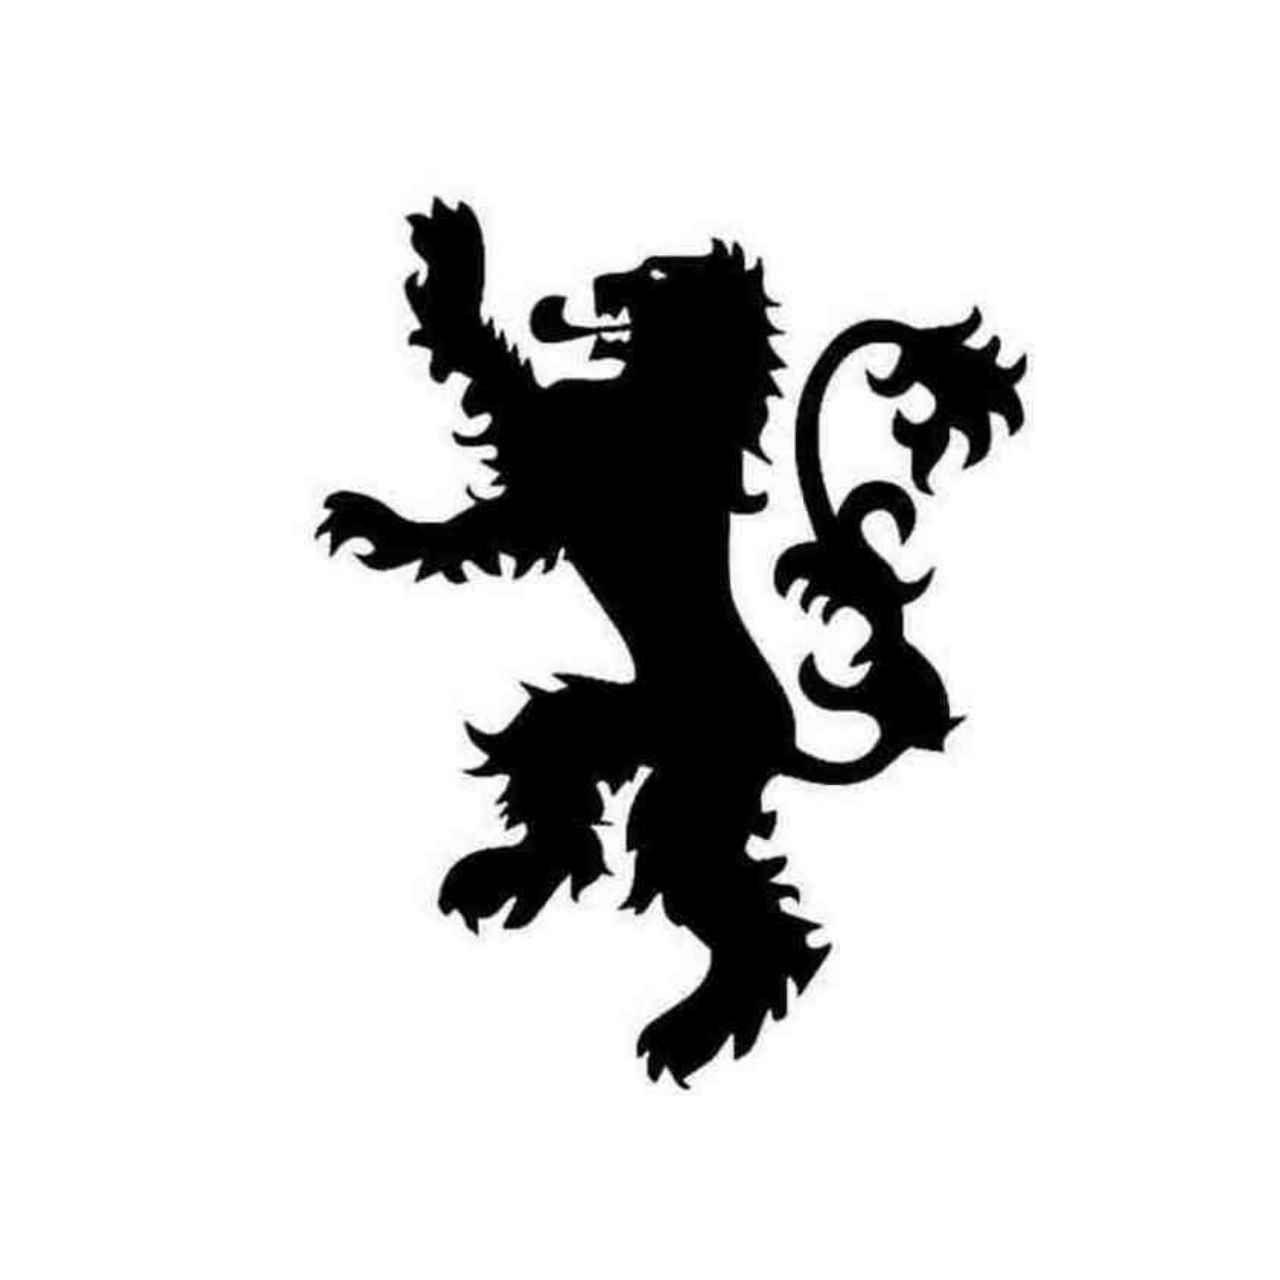 Game Of Thrones House Of Lannister Decal Sticker BallzBeatz.